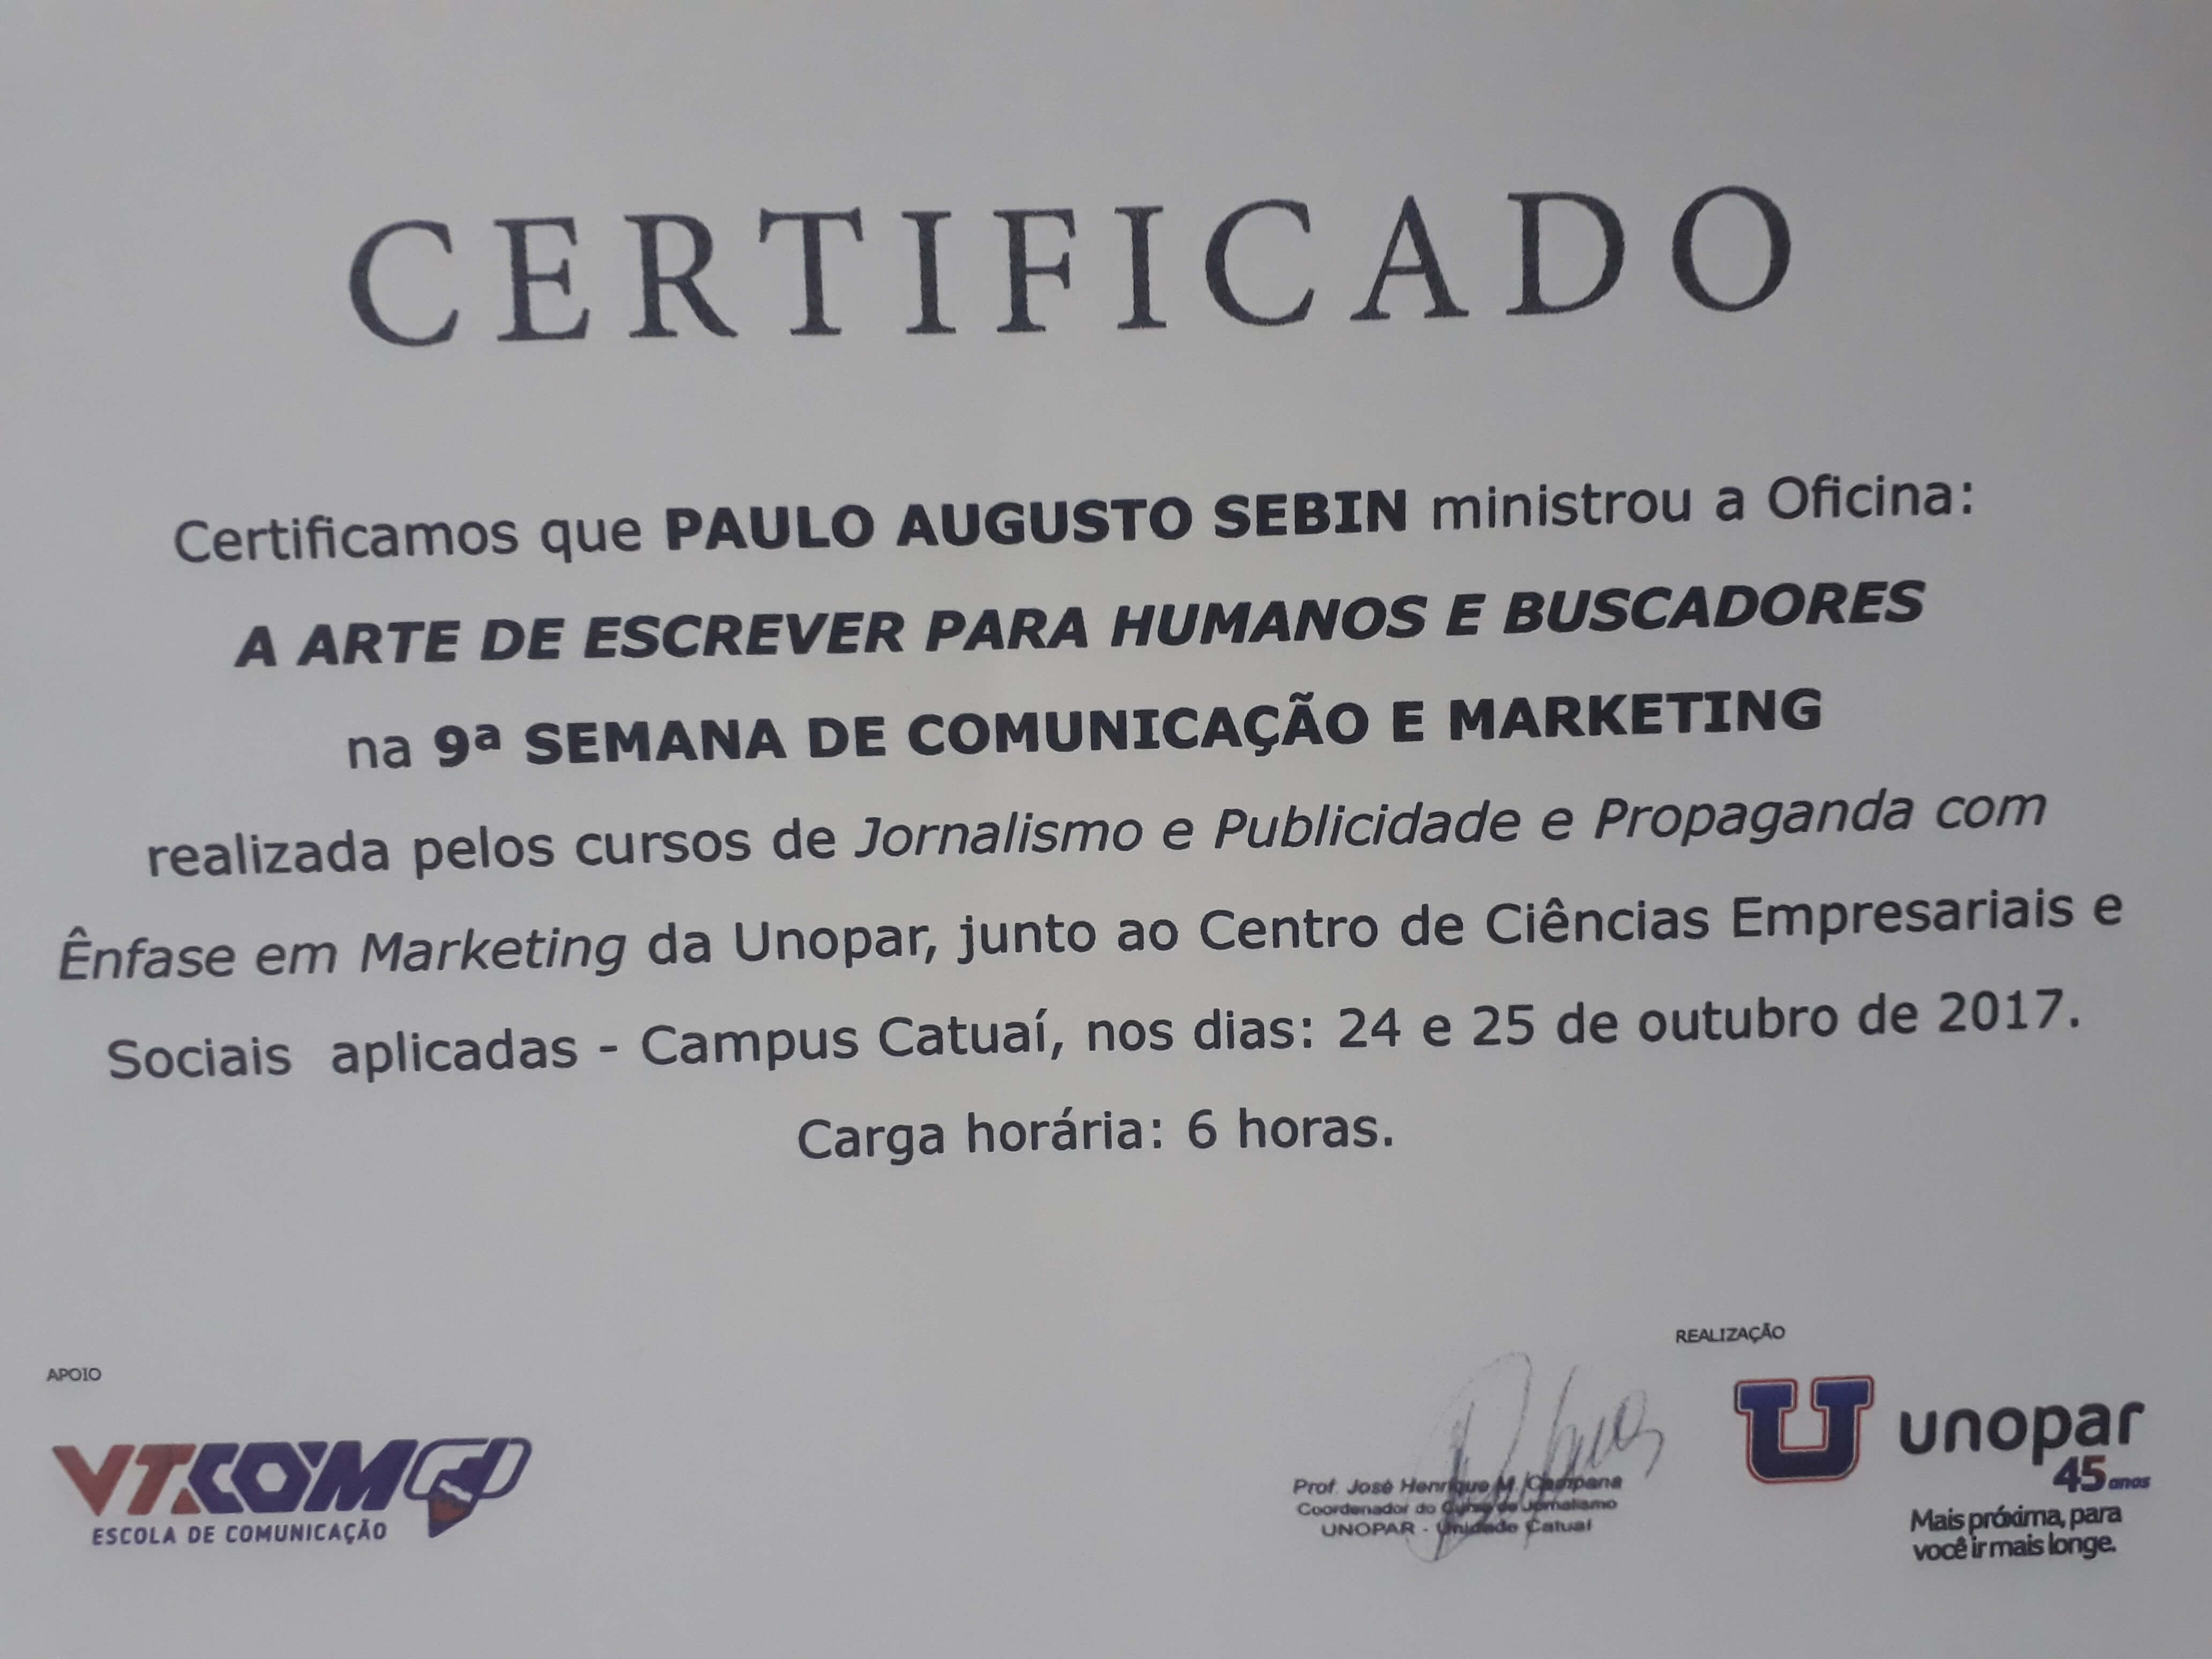 Certificado ministro da oficina Escrever para Humanos e Buscadores - Jornalismo Unopar